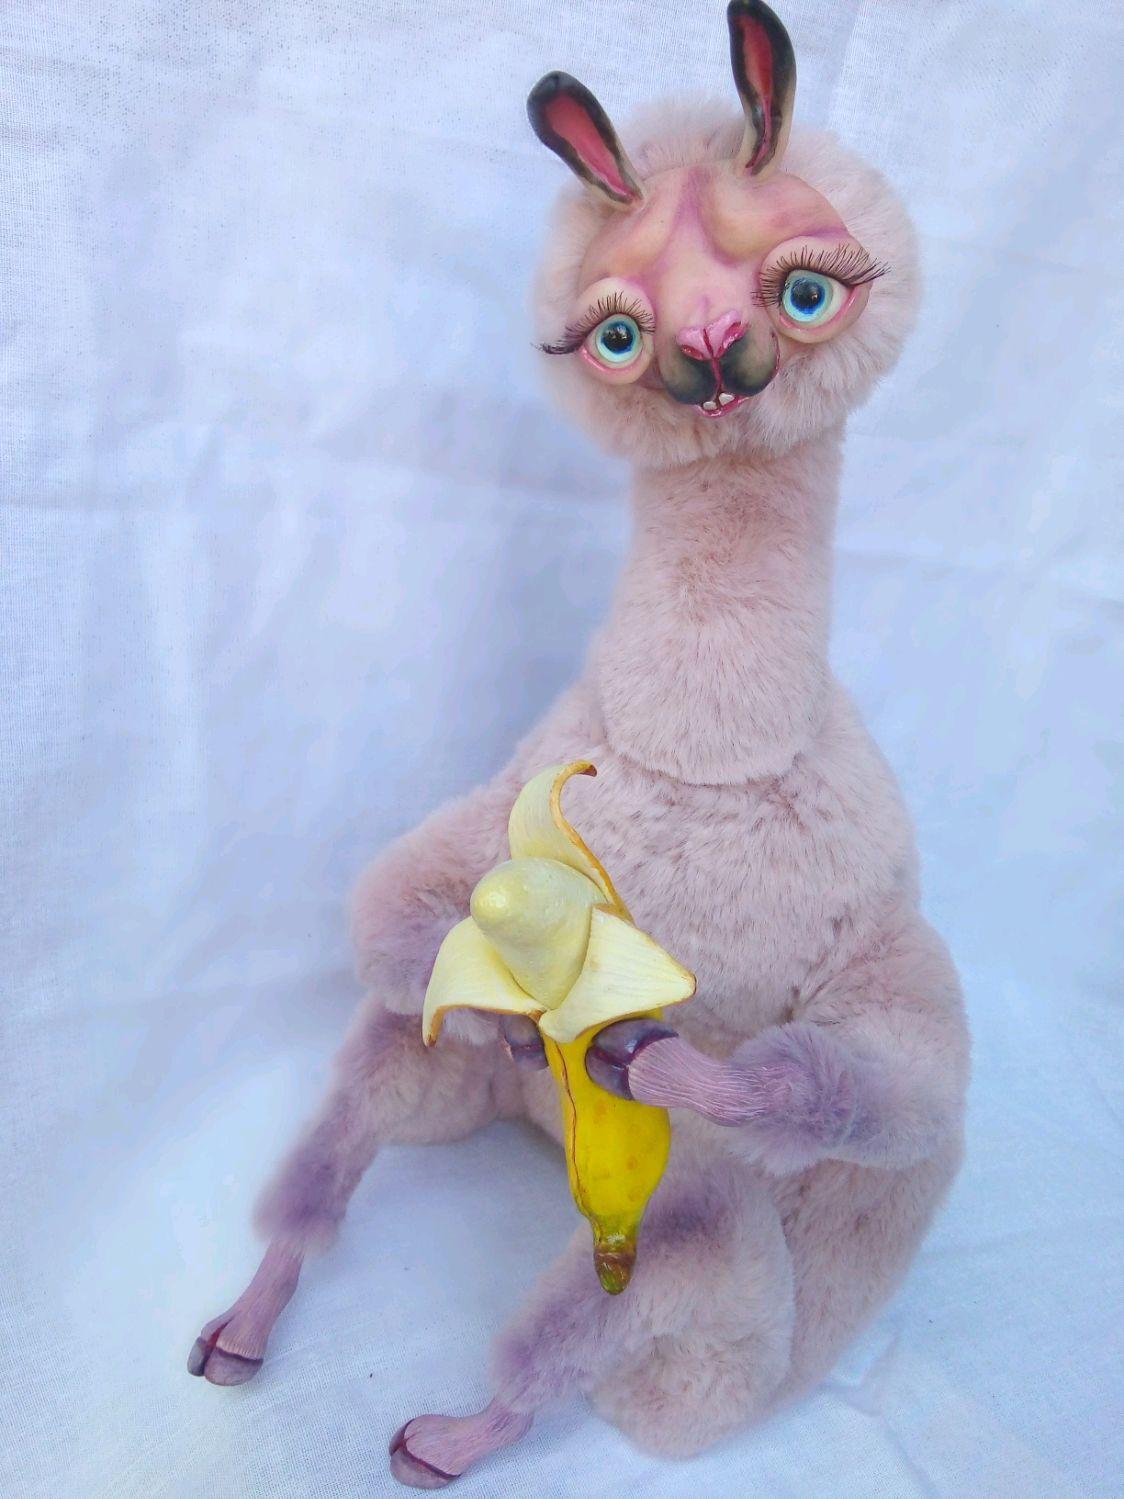 """ЛАМА и банан"" интерьерная, коллекционная кукла игрушка, Интерьерная кукла, Каменск-Шахтинский,  Фото №1"